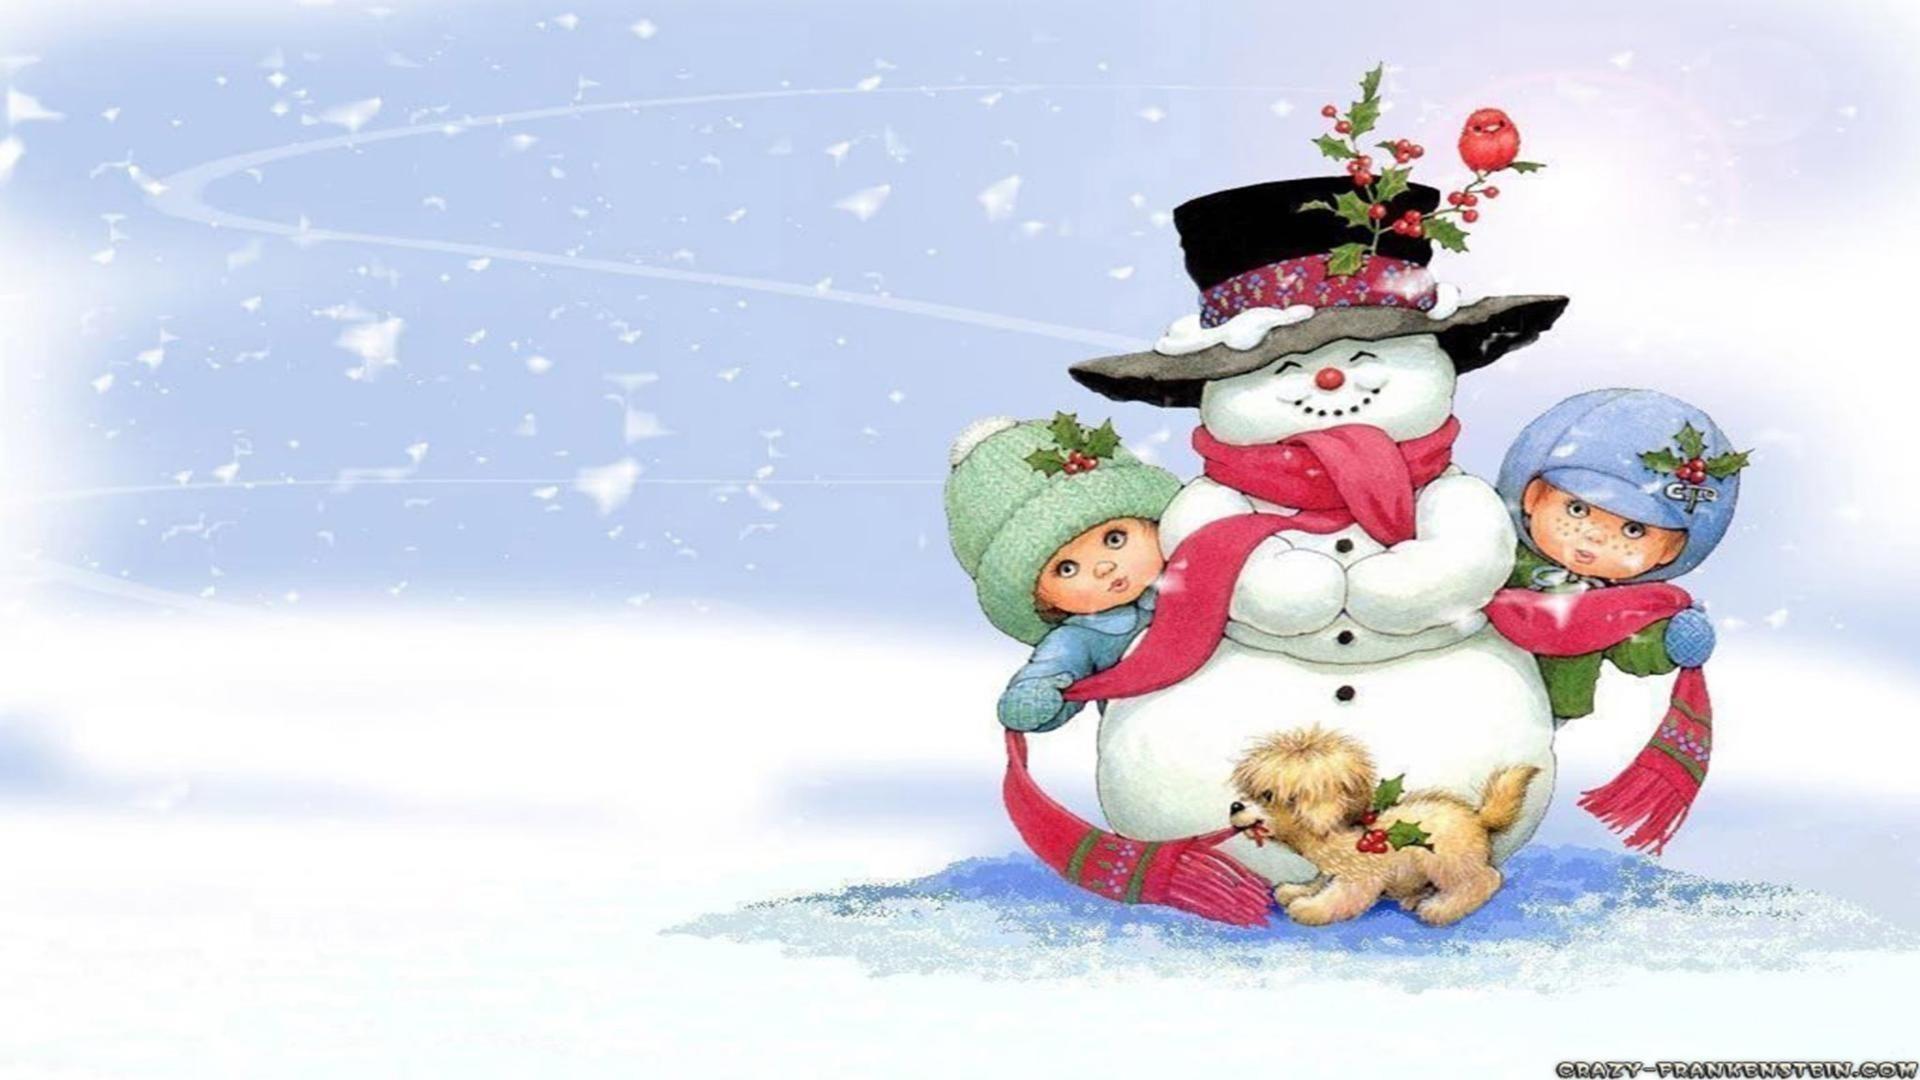 Snowman on Christmas scene 25 december celebration day free .